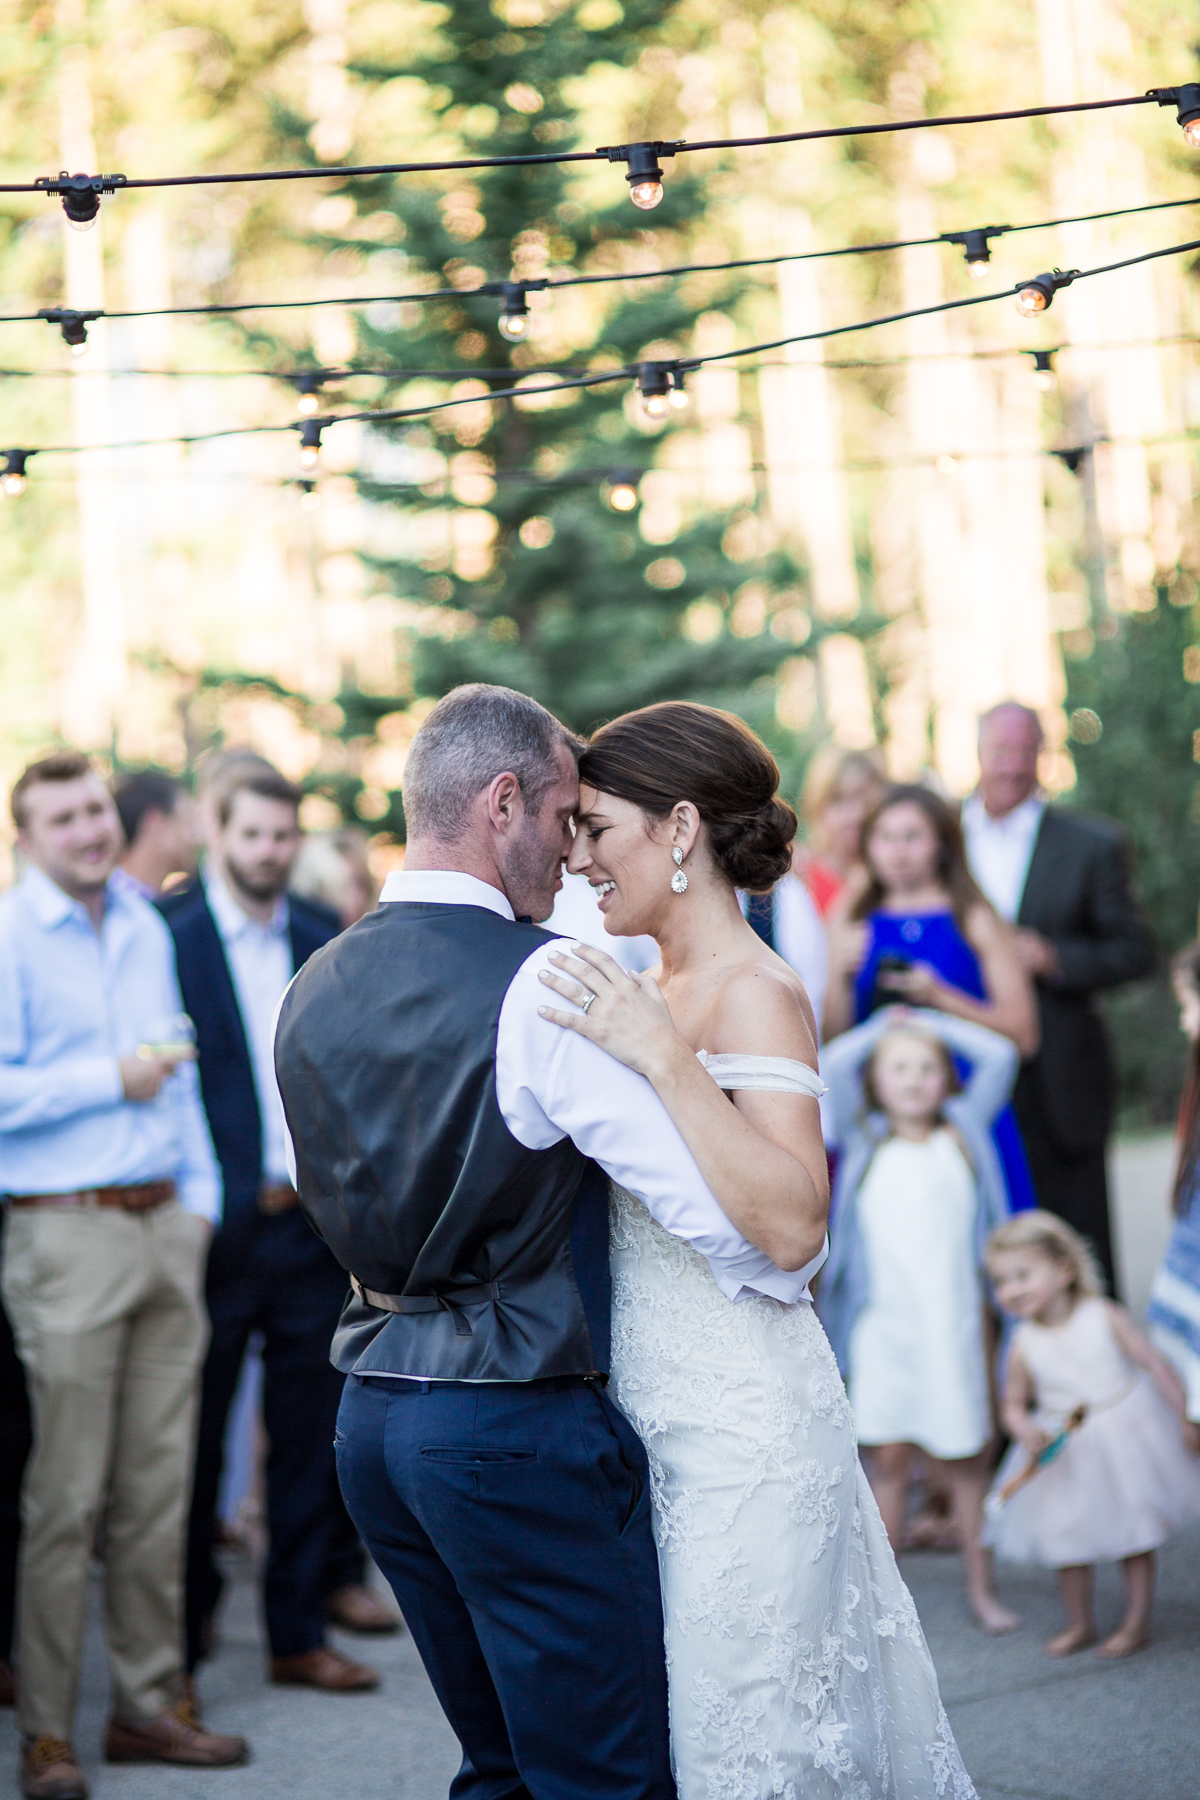 StaciDesign-Colorado-Wedding-5637.jpg